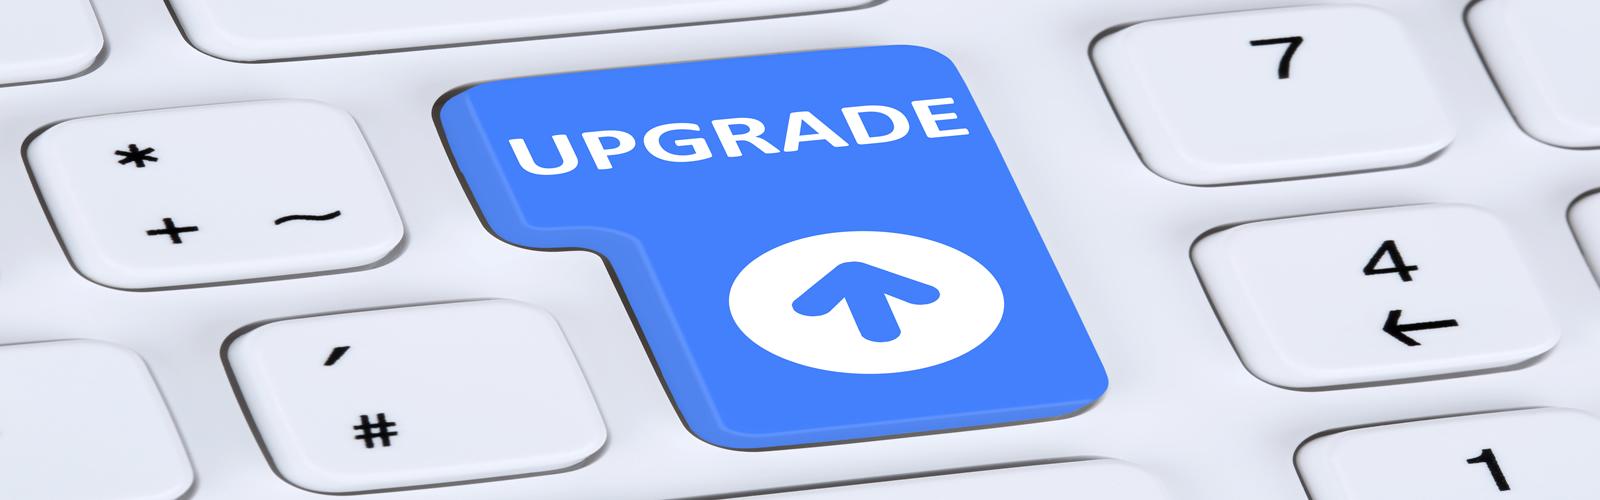 WebCenter 11g Upgrade